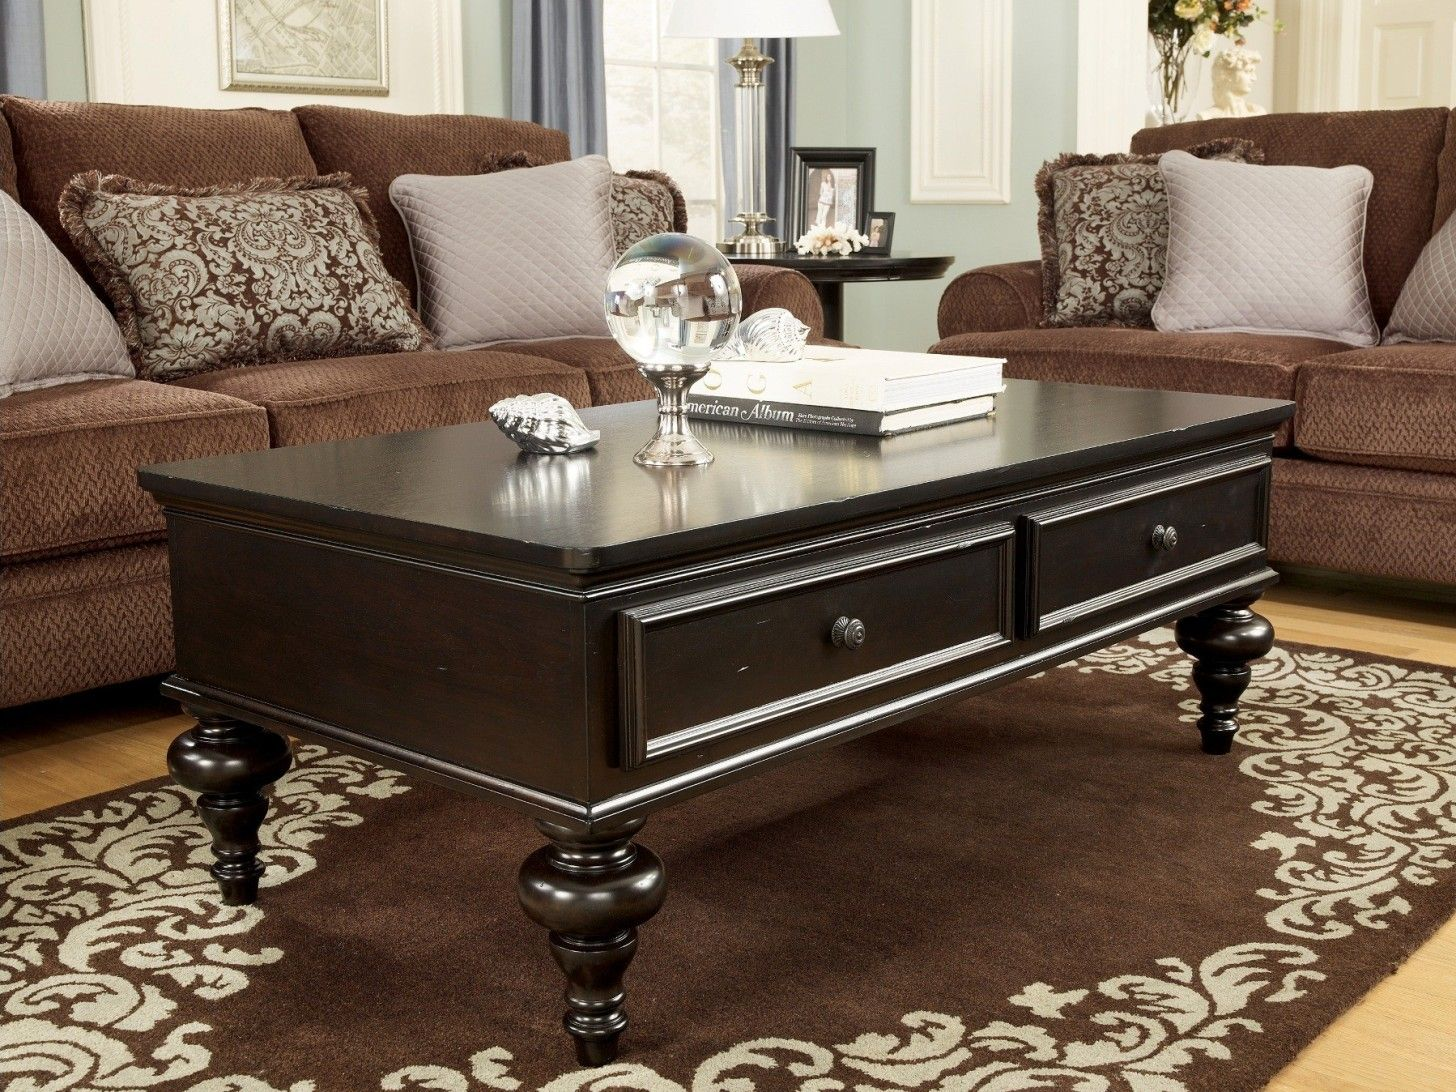 12 dark wood coffee tables ideas